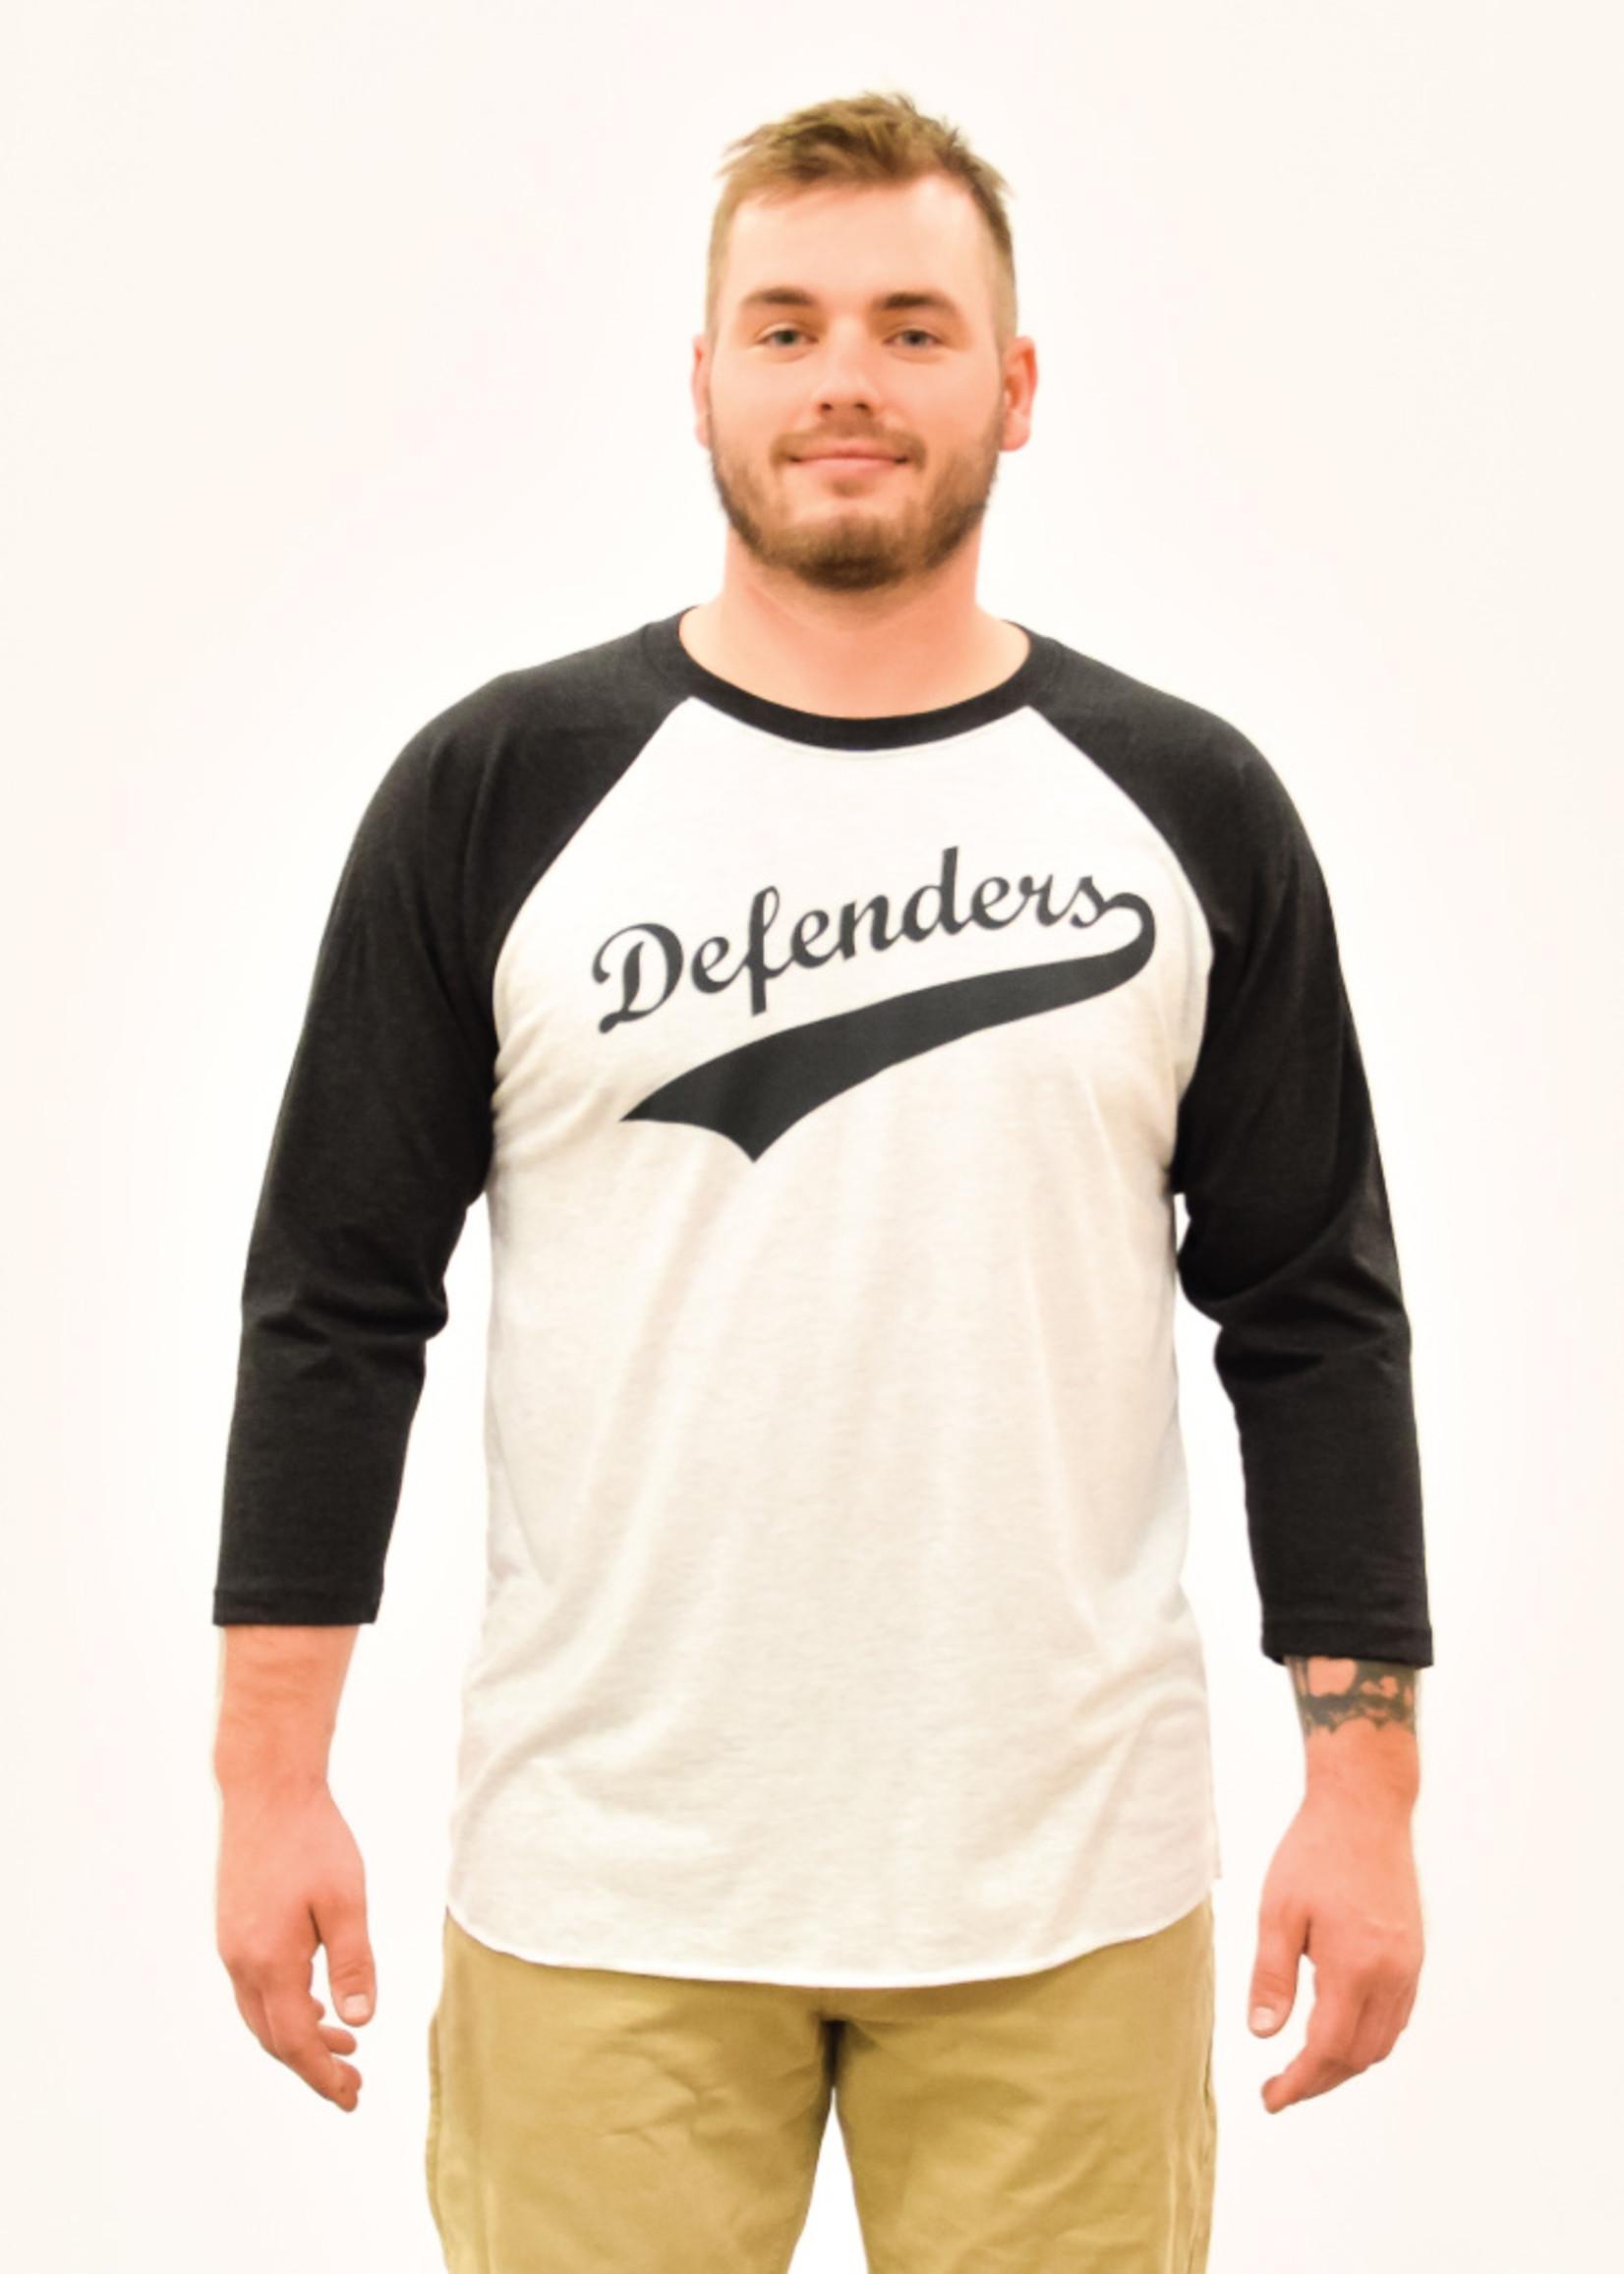 Defenders Baseball T-Shirt